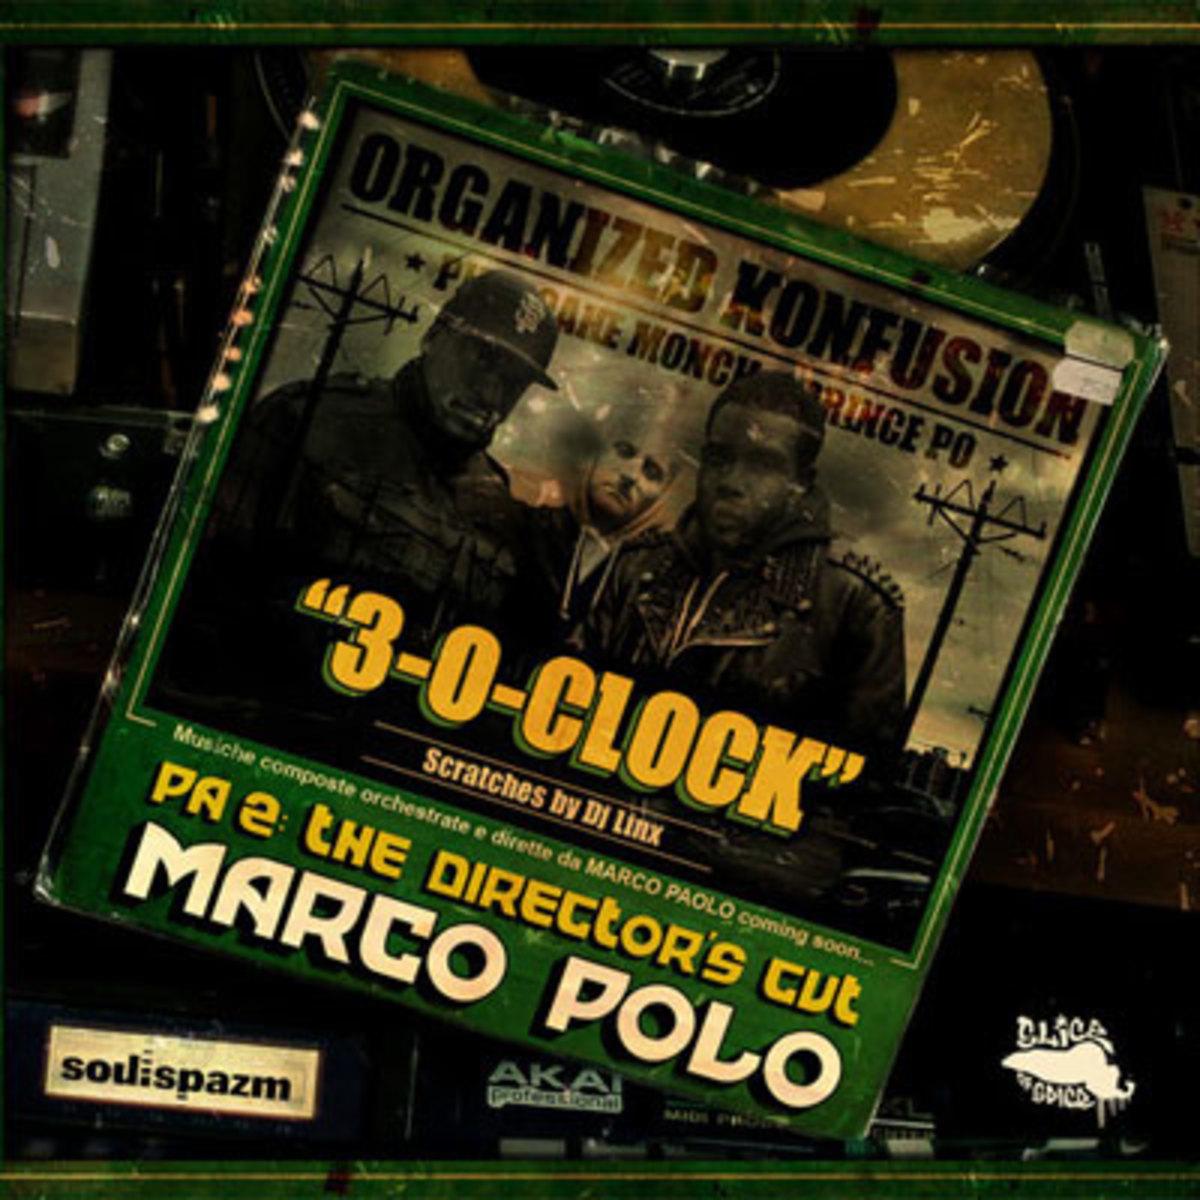 marcopolo-30clock.jpg